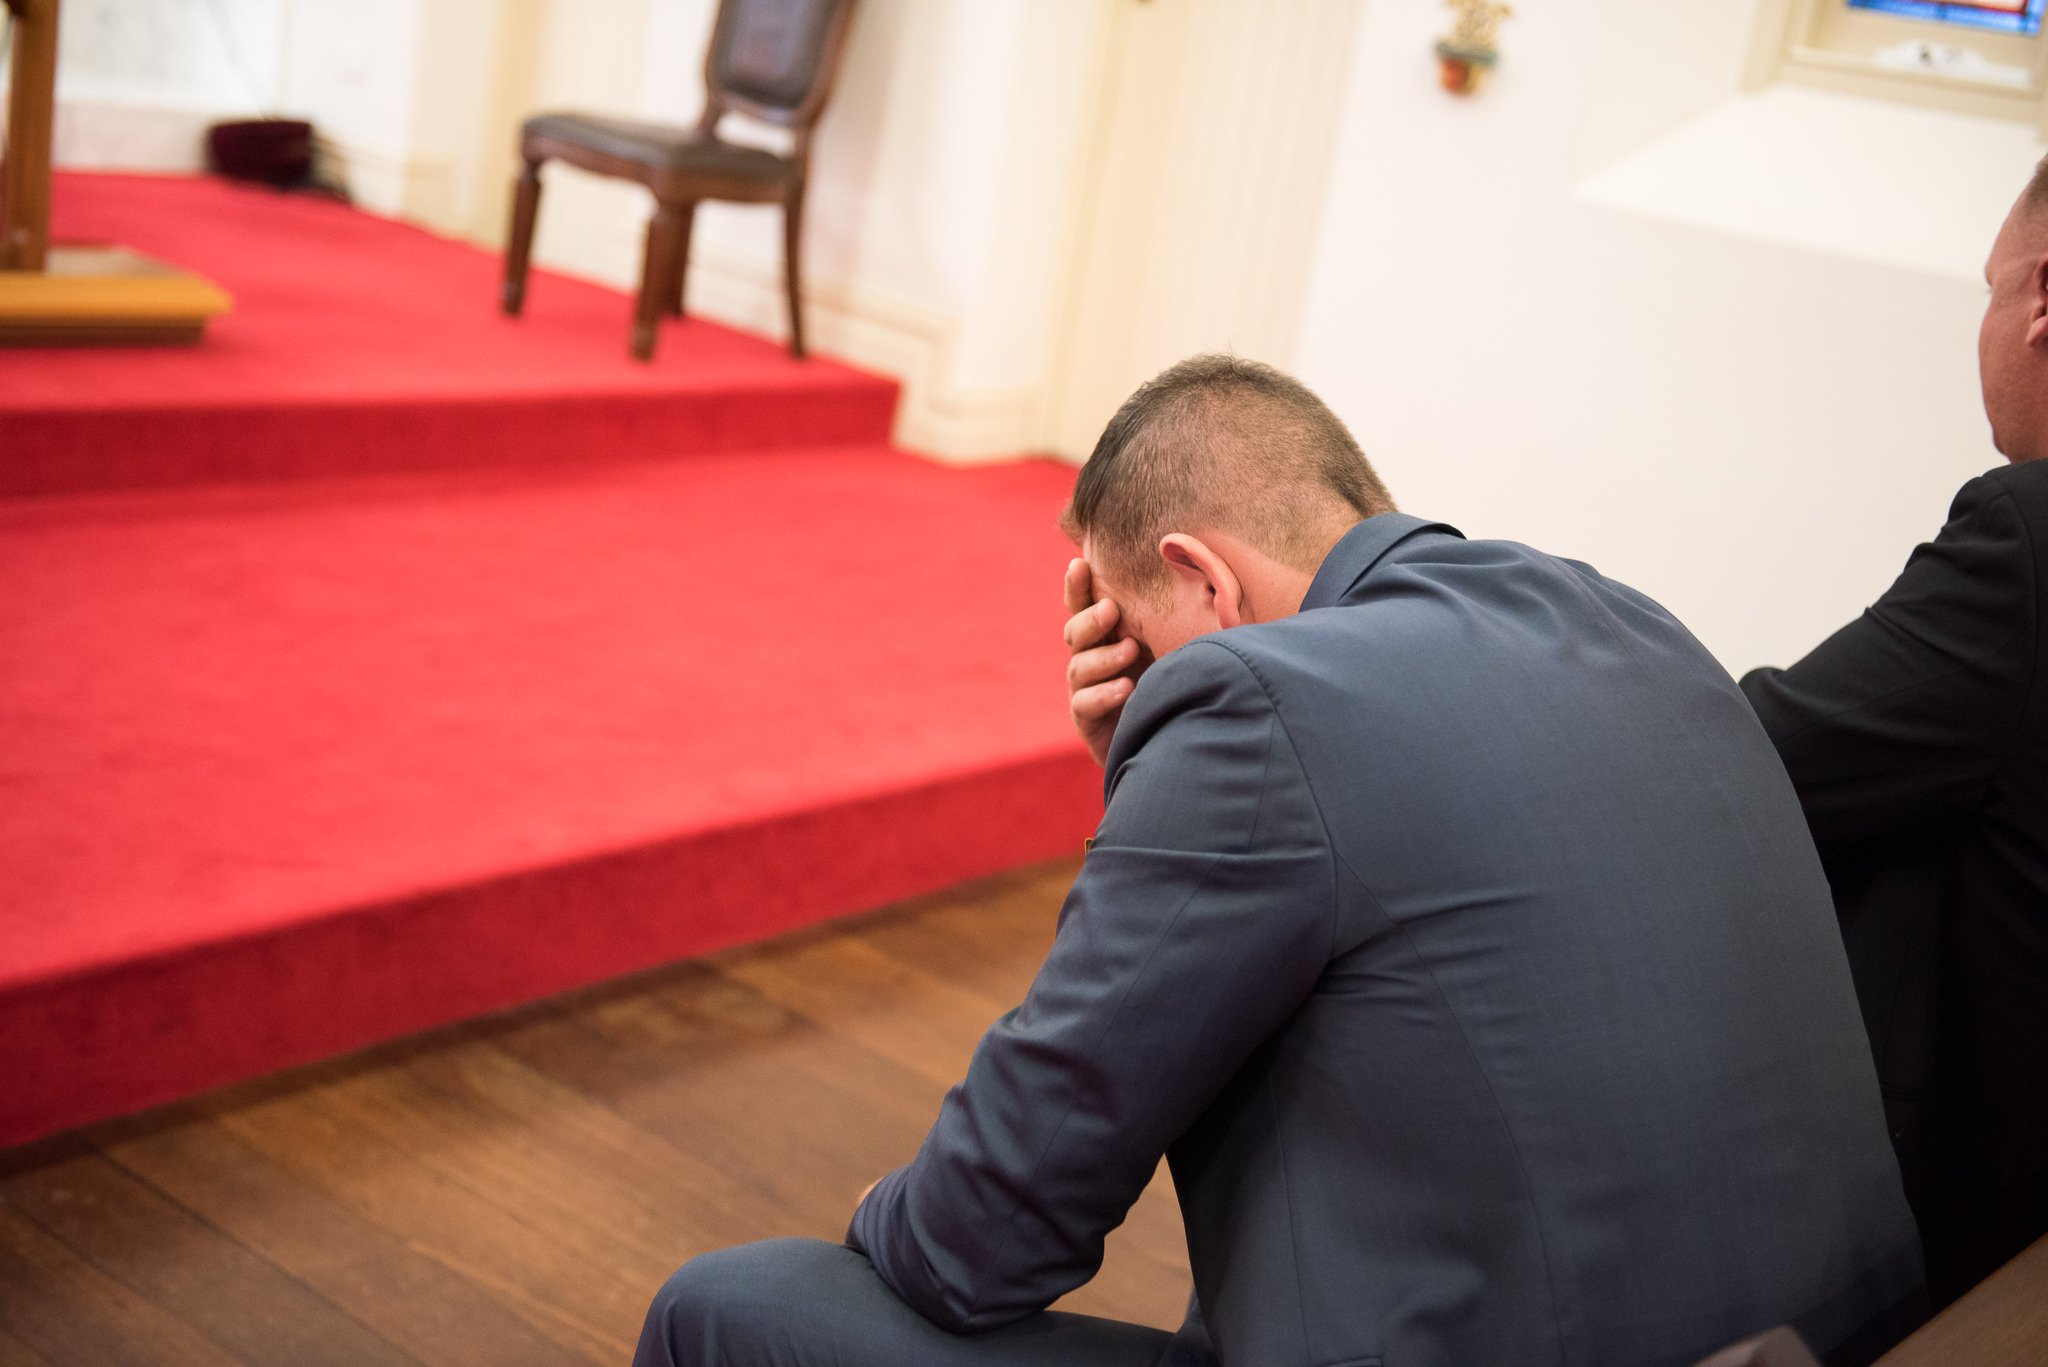 groom holding his head waiting